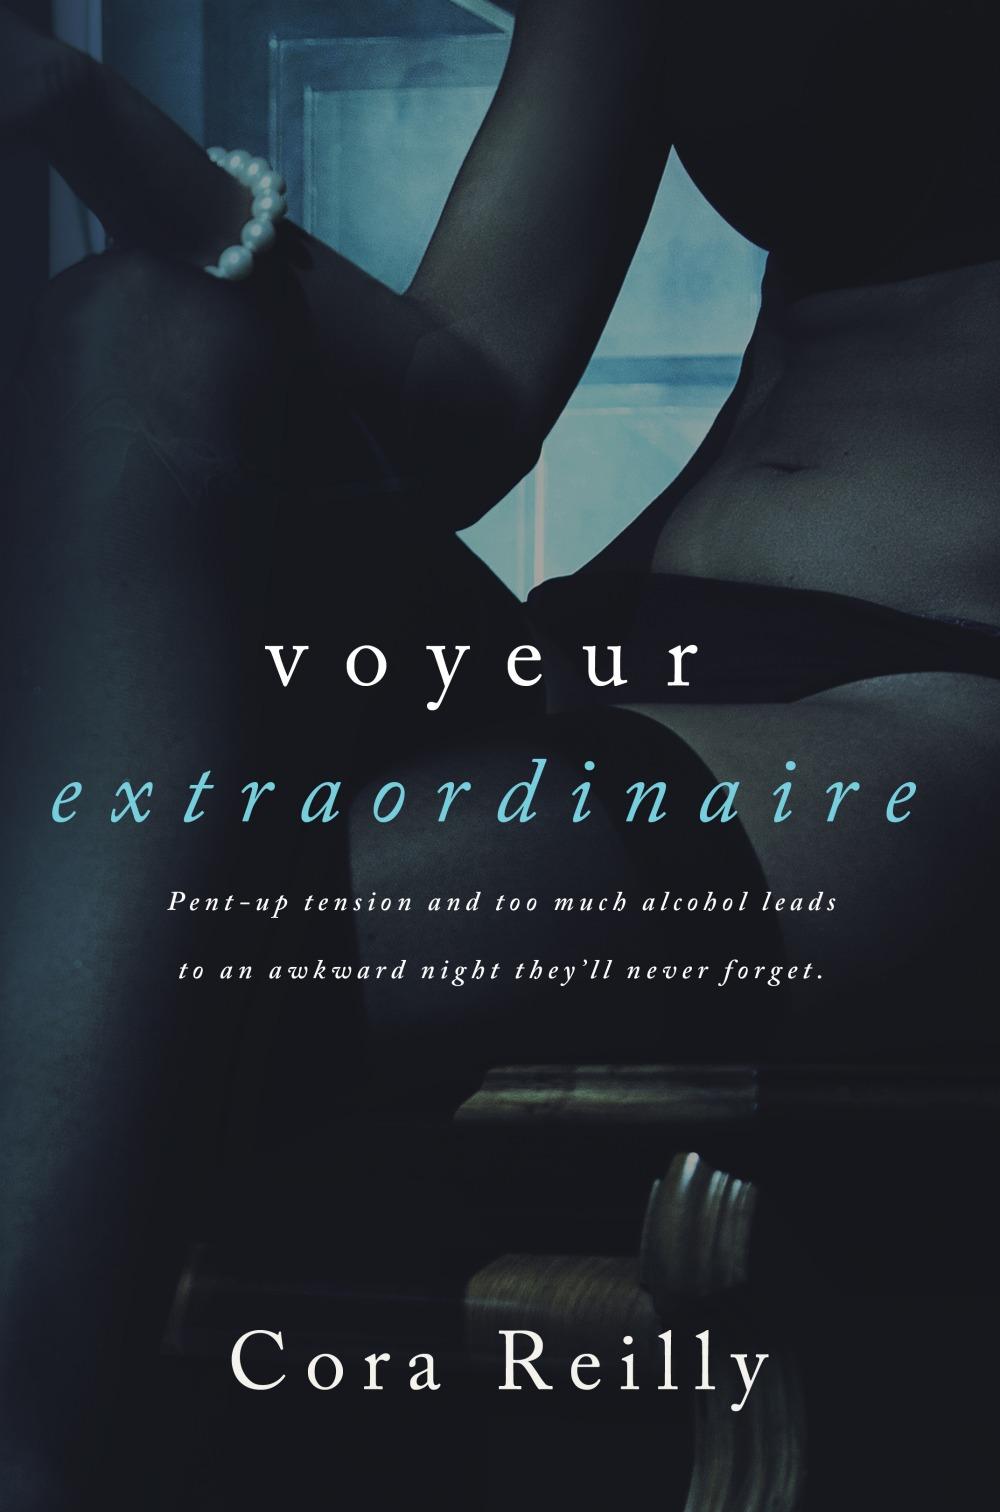 VOYEUR Book Cover.jpg